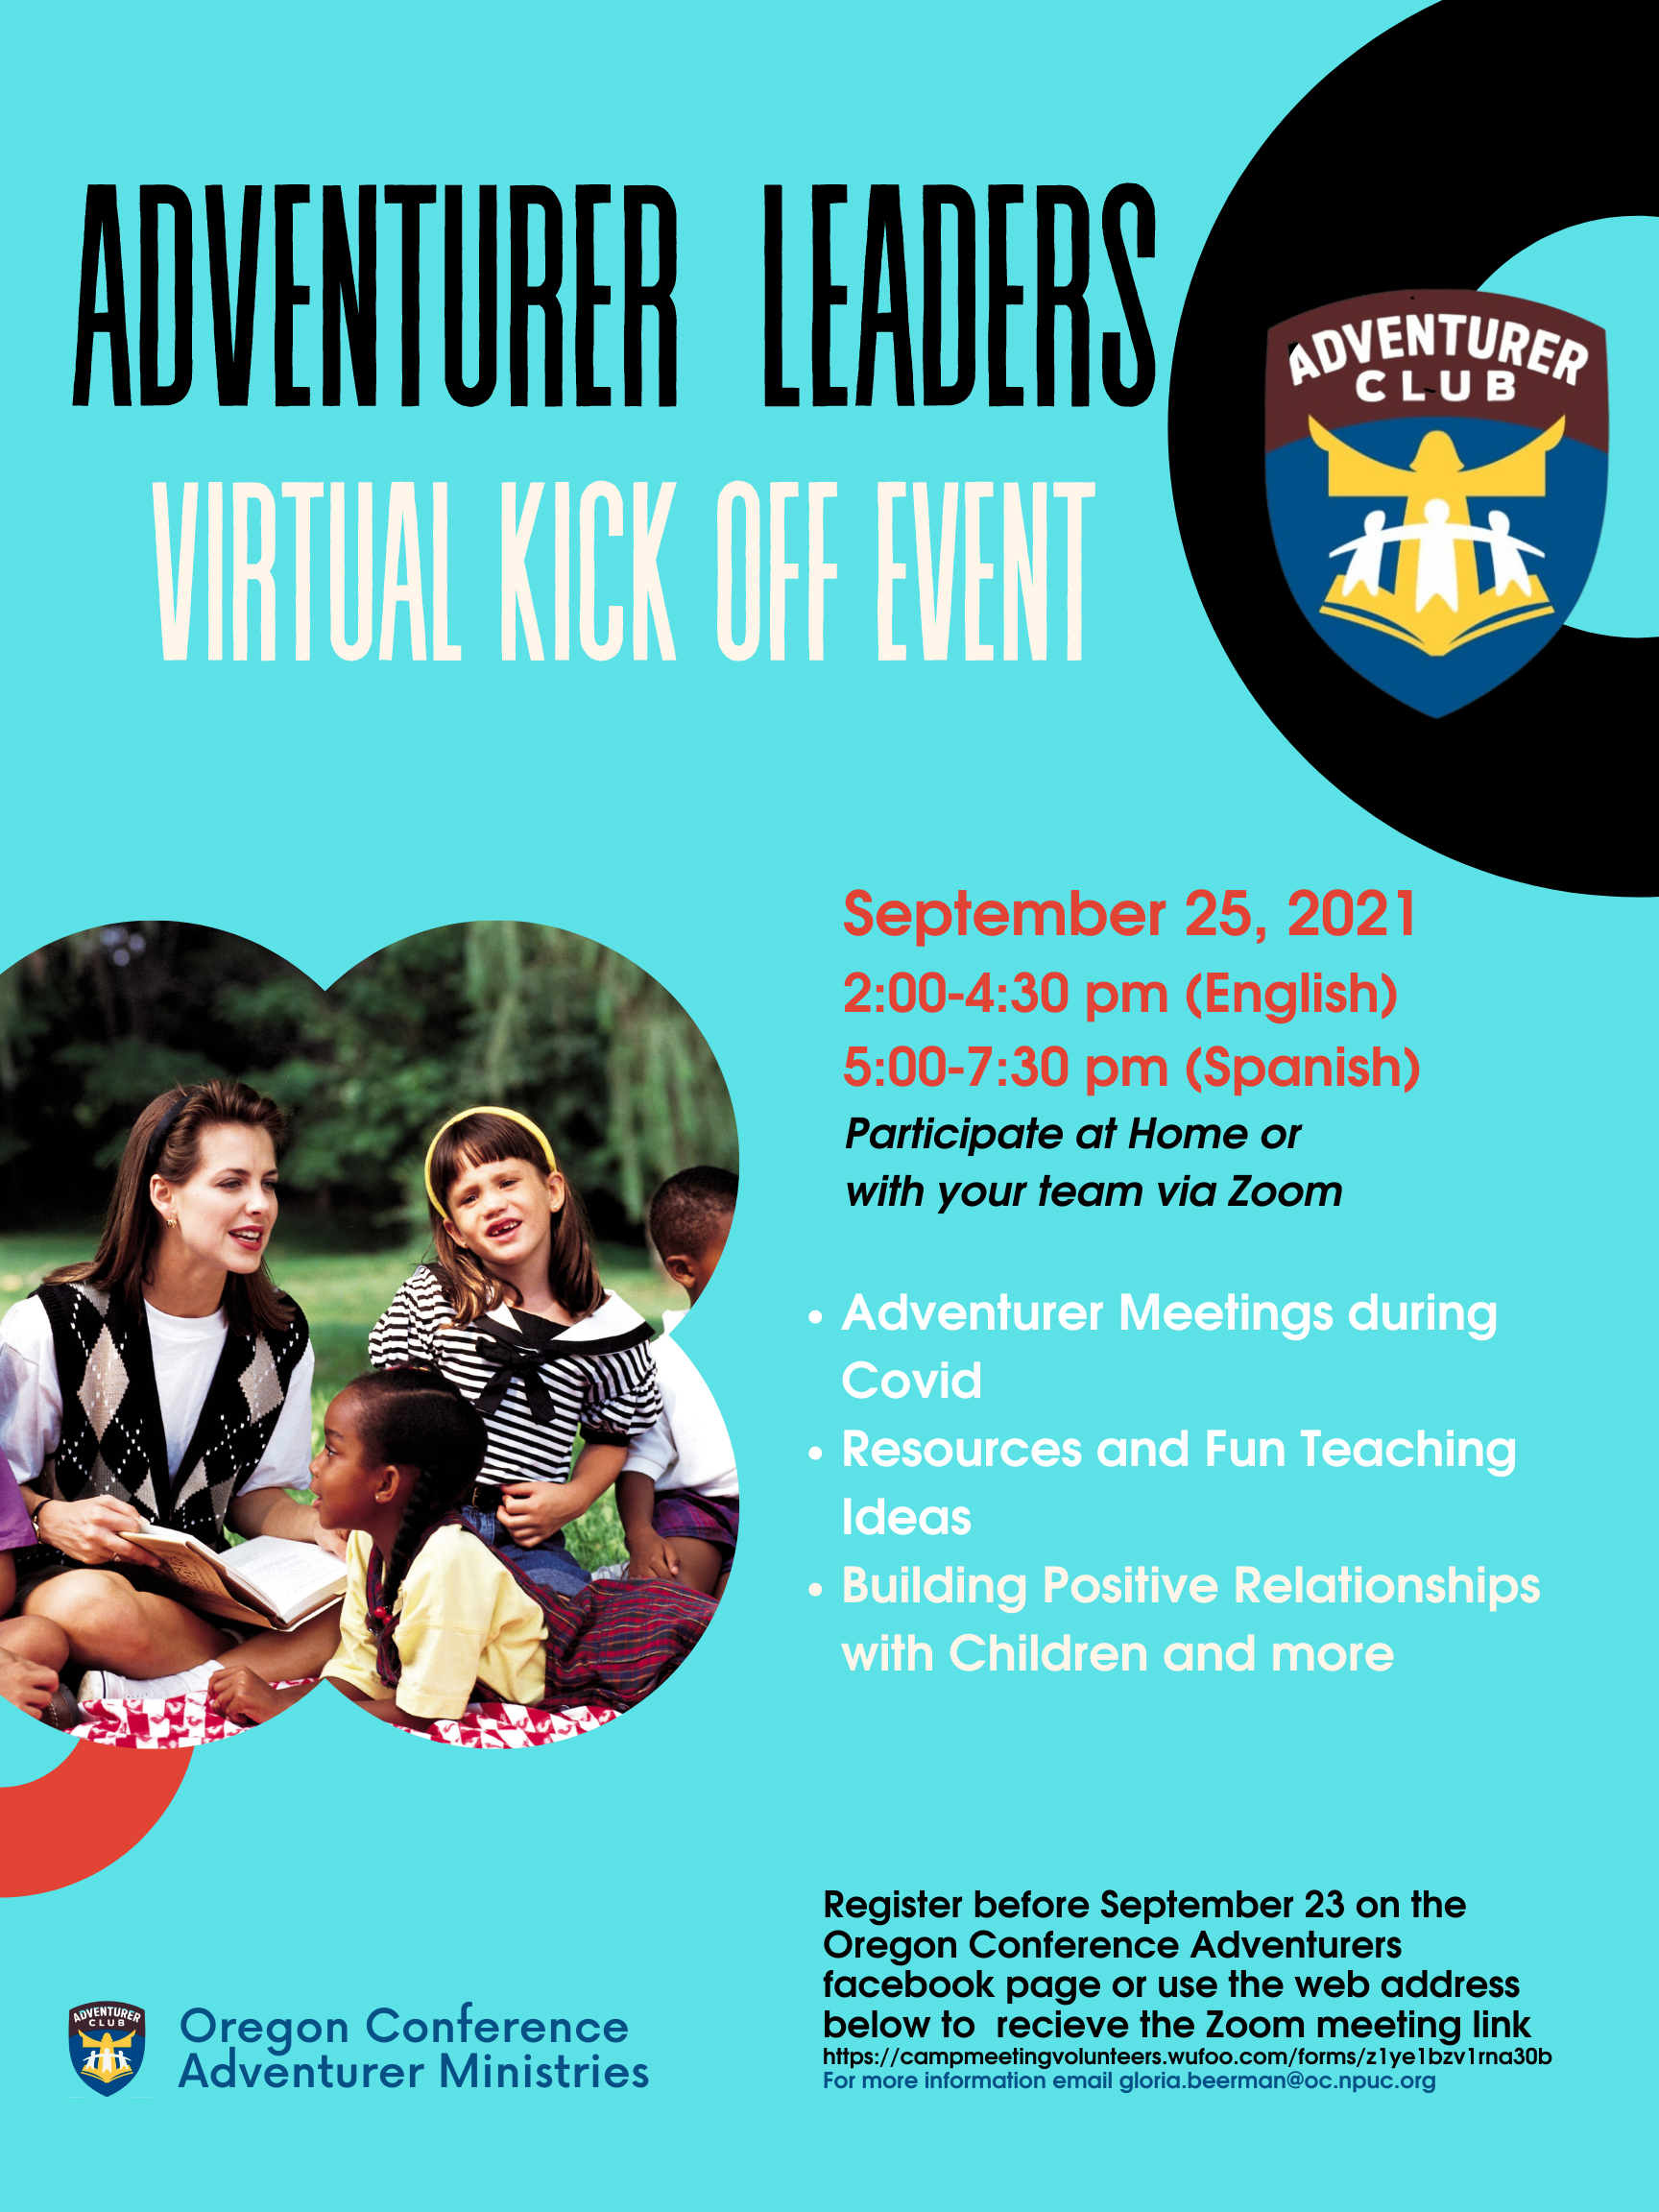 Adventurer leaders kick off event poster